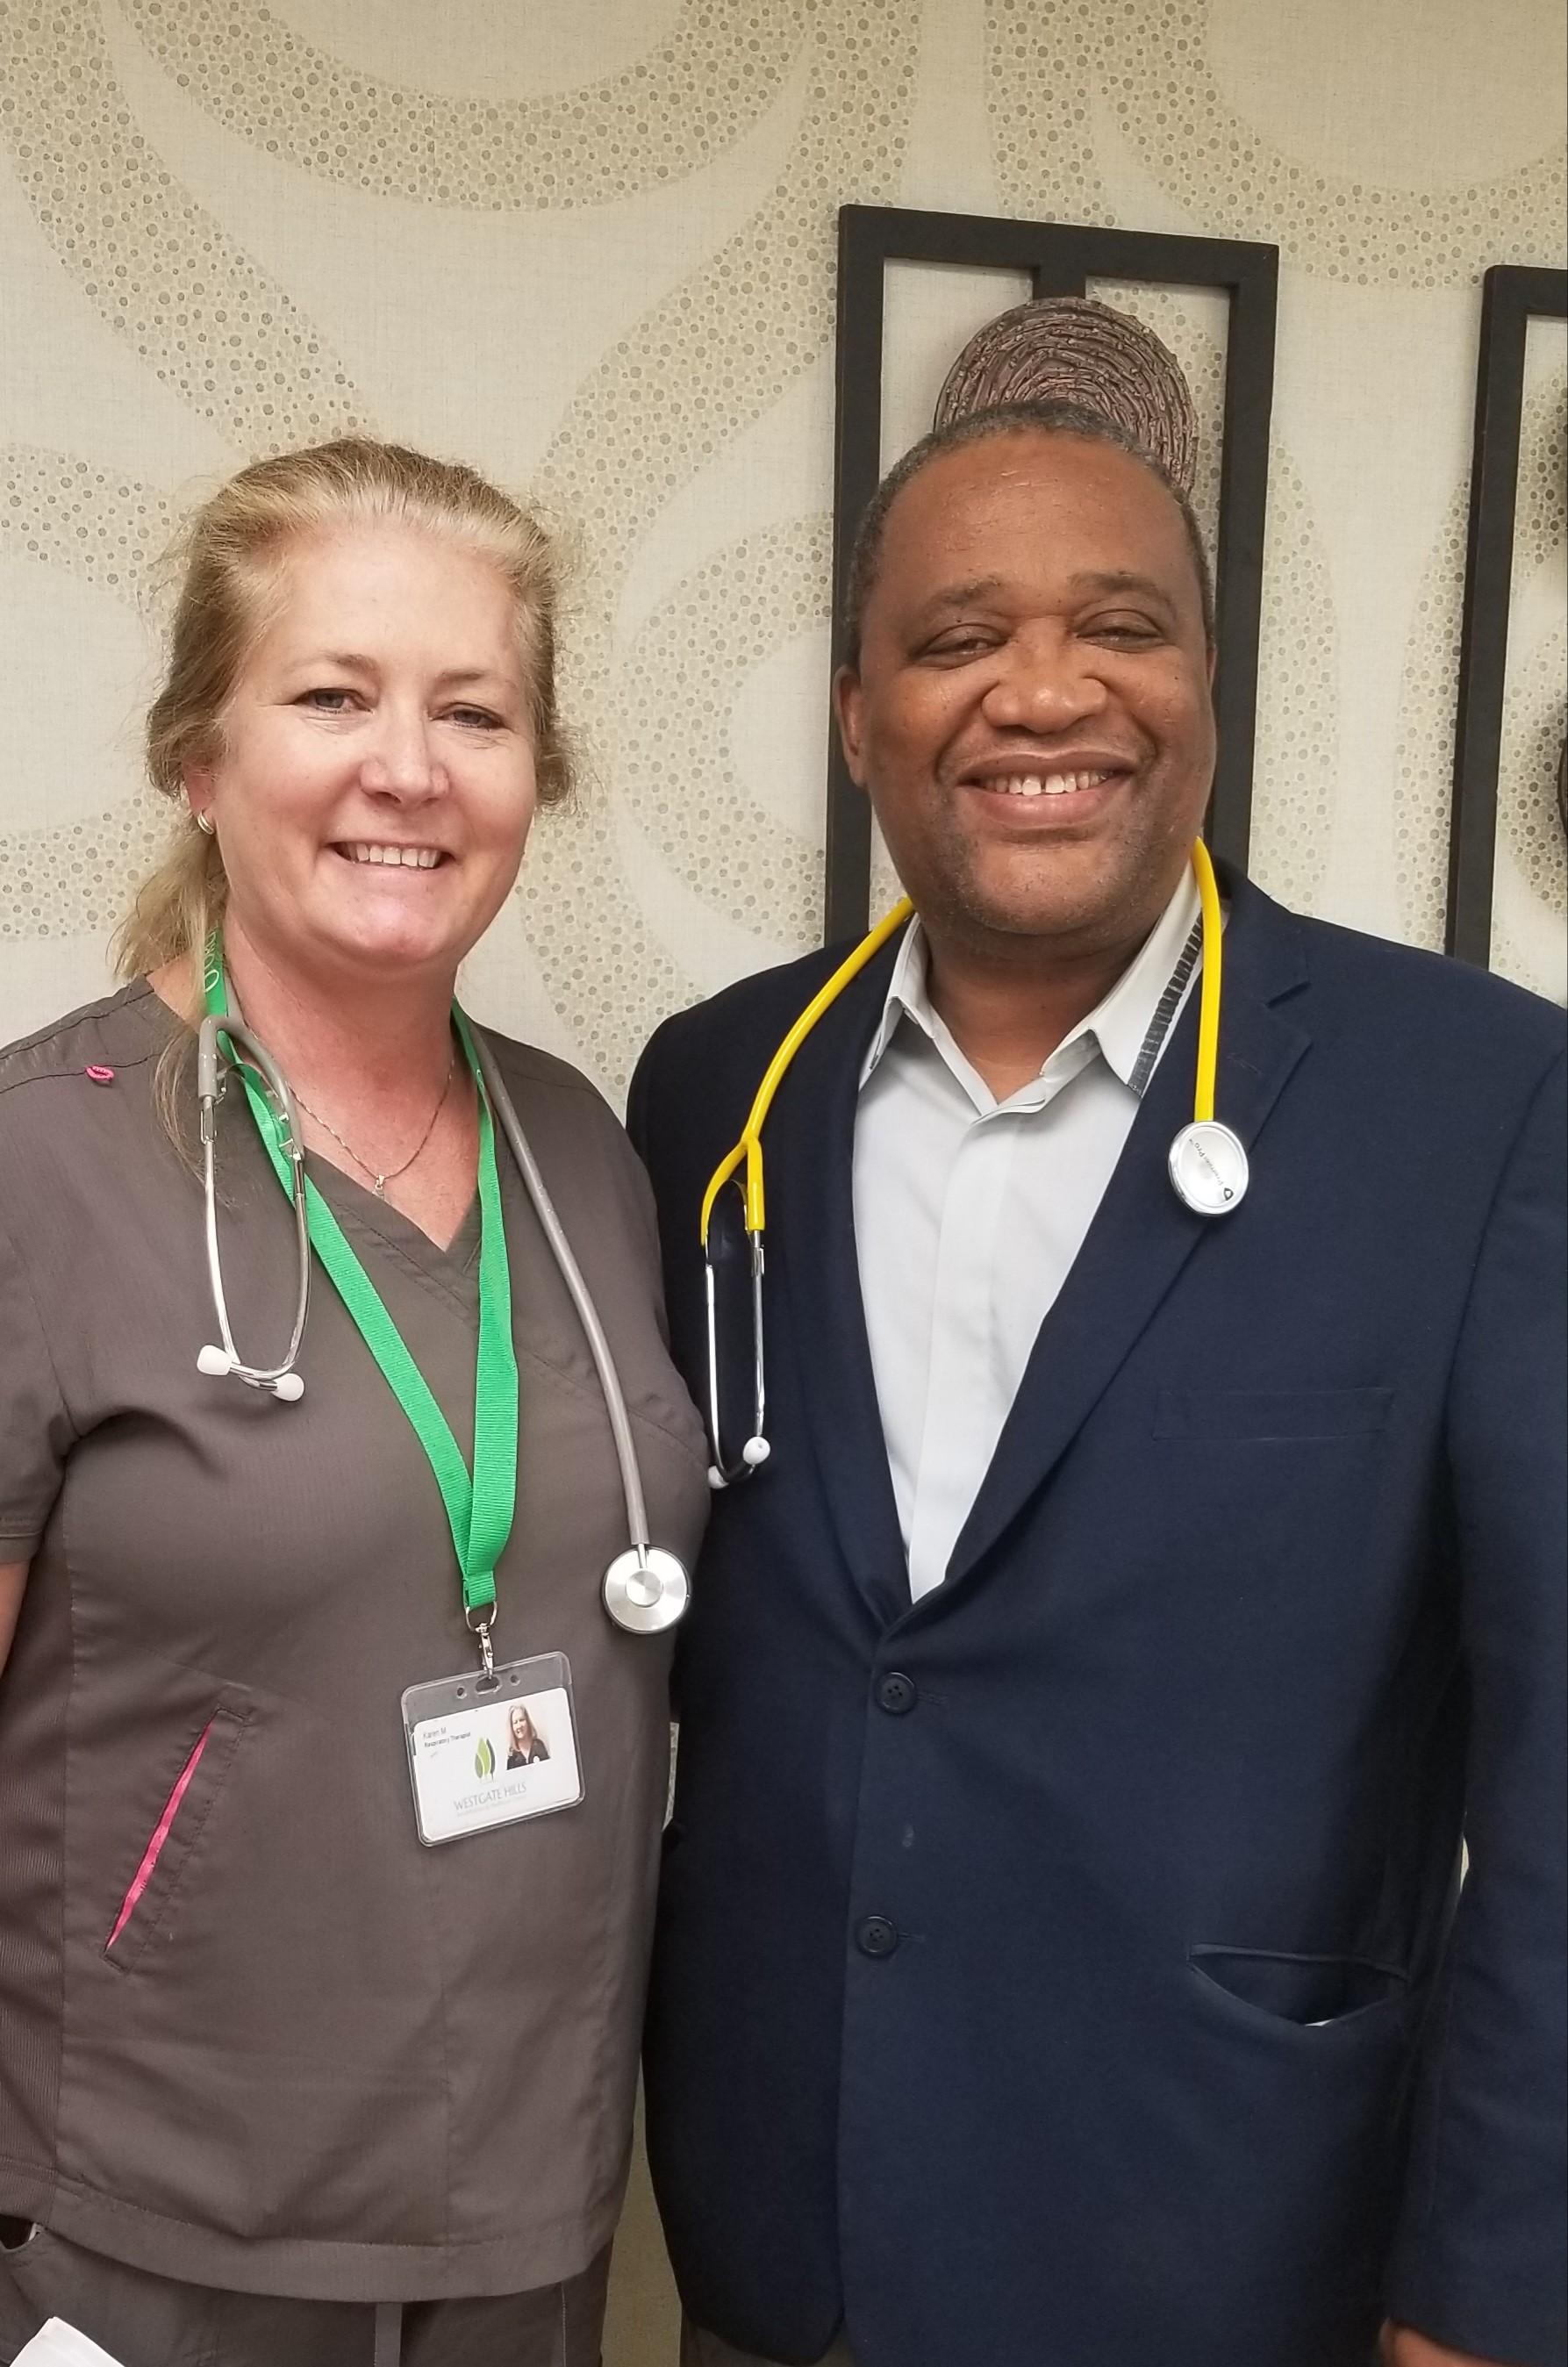 Our Respiratory Therapist & Pulmonologist